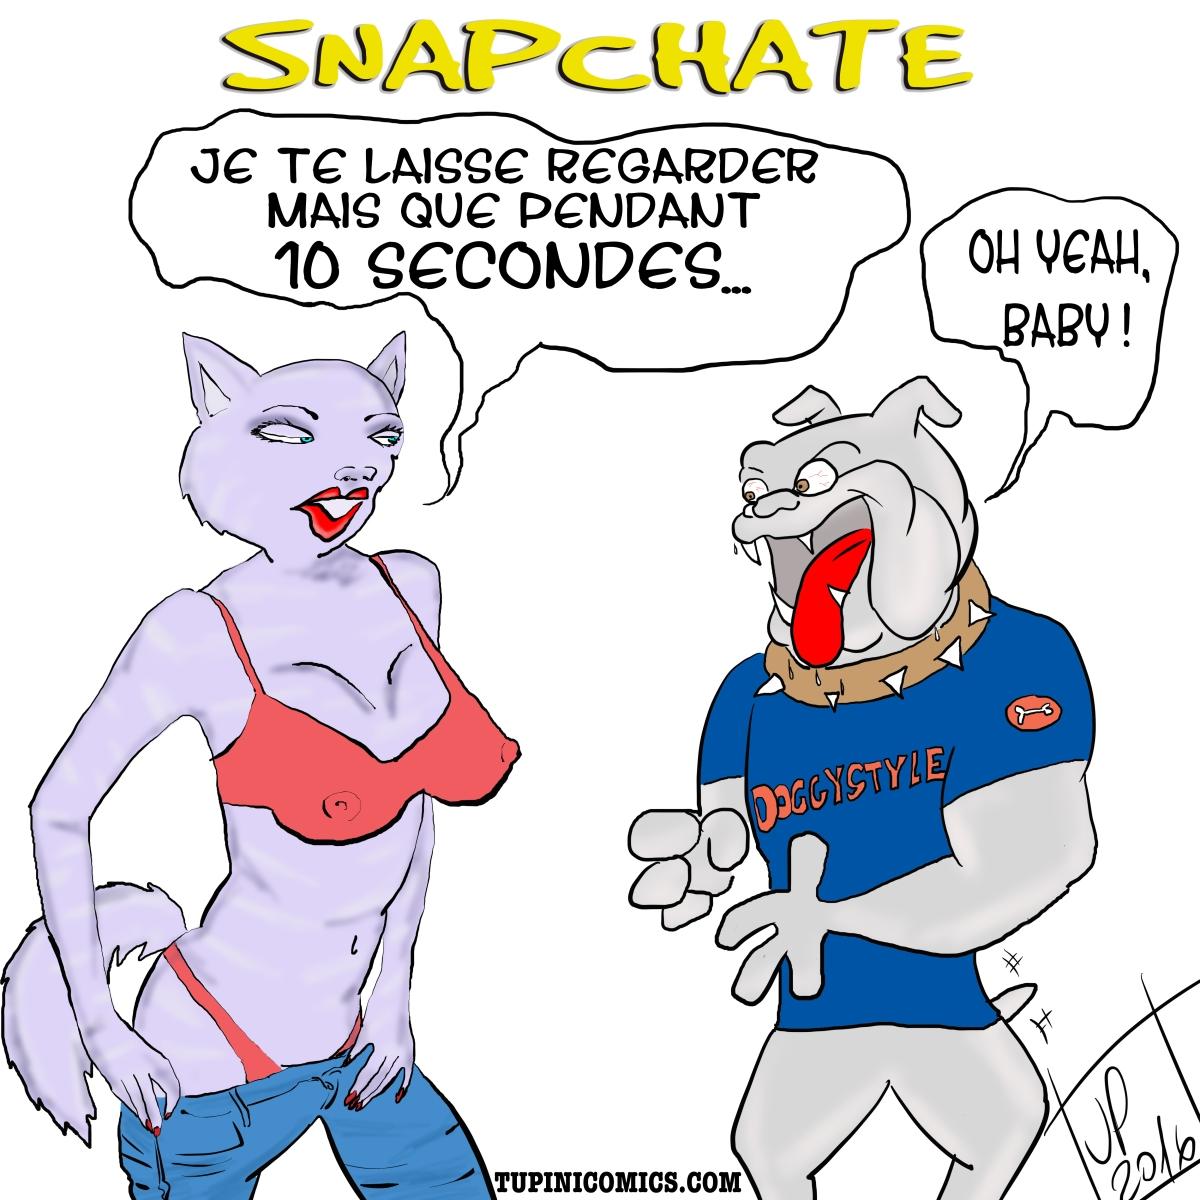 Snapchate